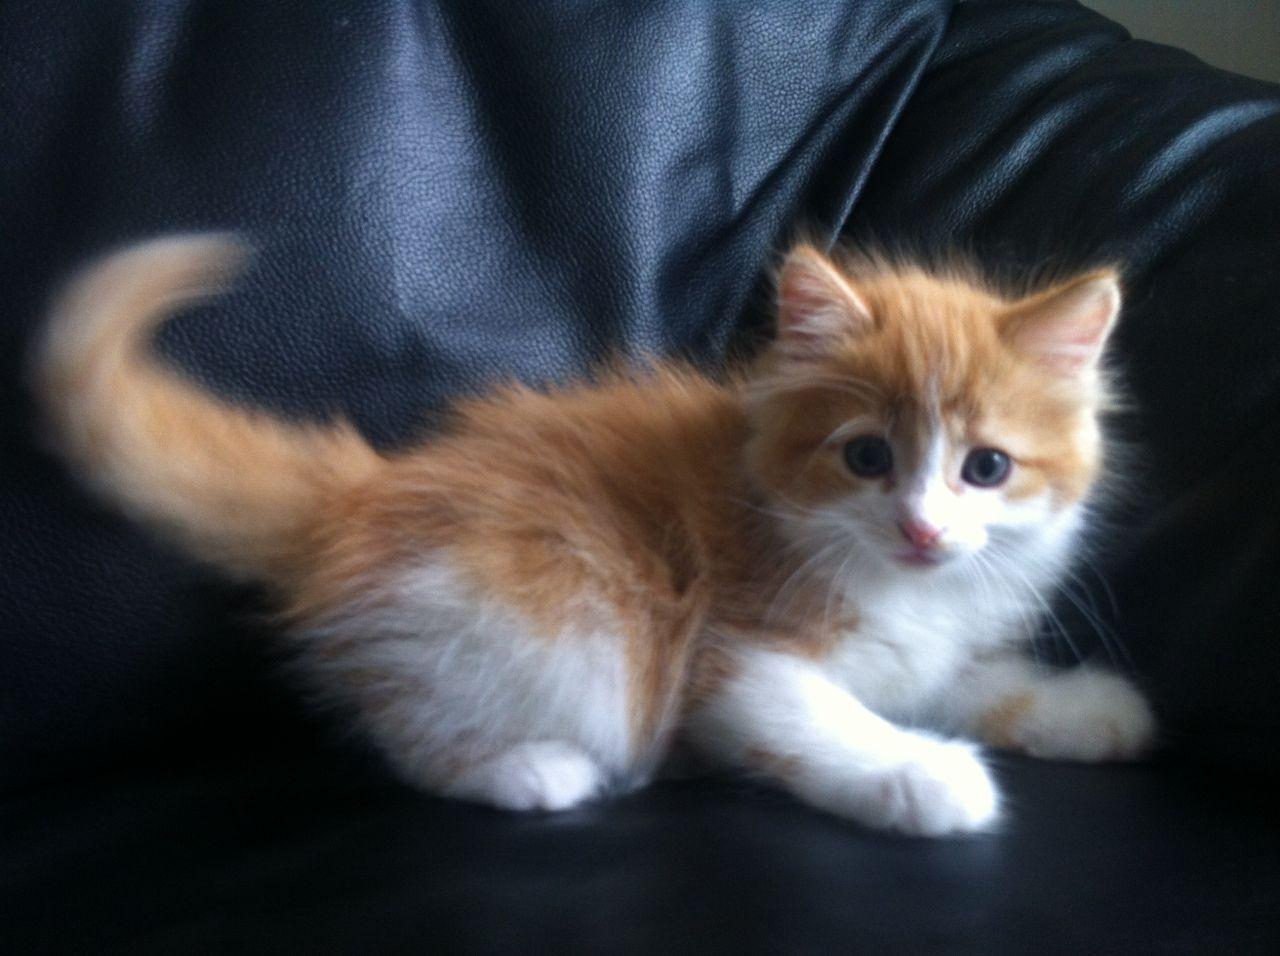 Cute fluffy kitten for sale! Cute fluffy kittens, Fluffy